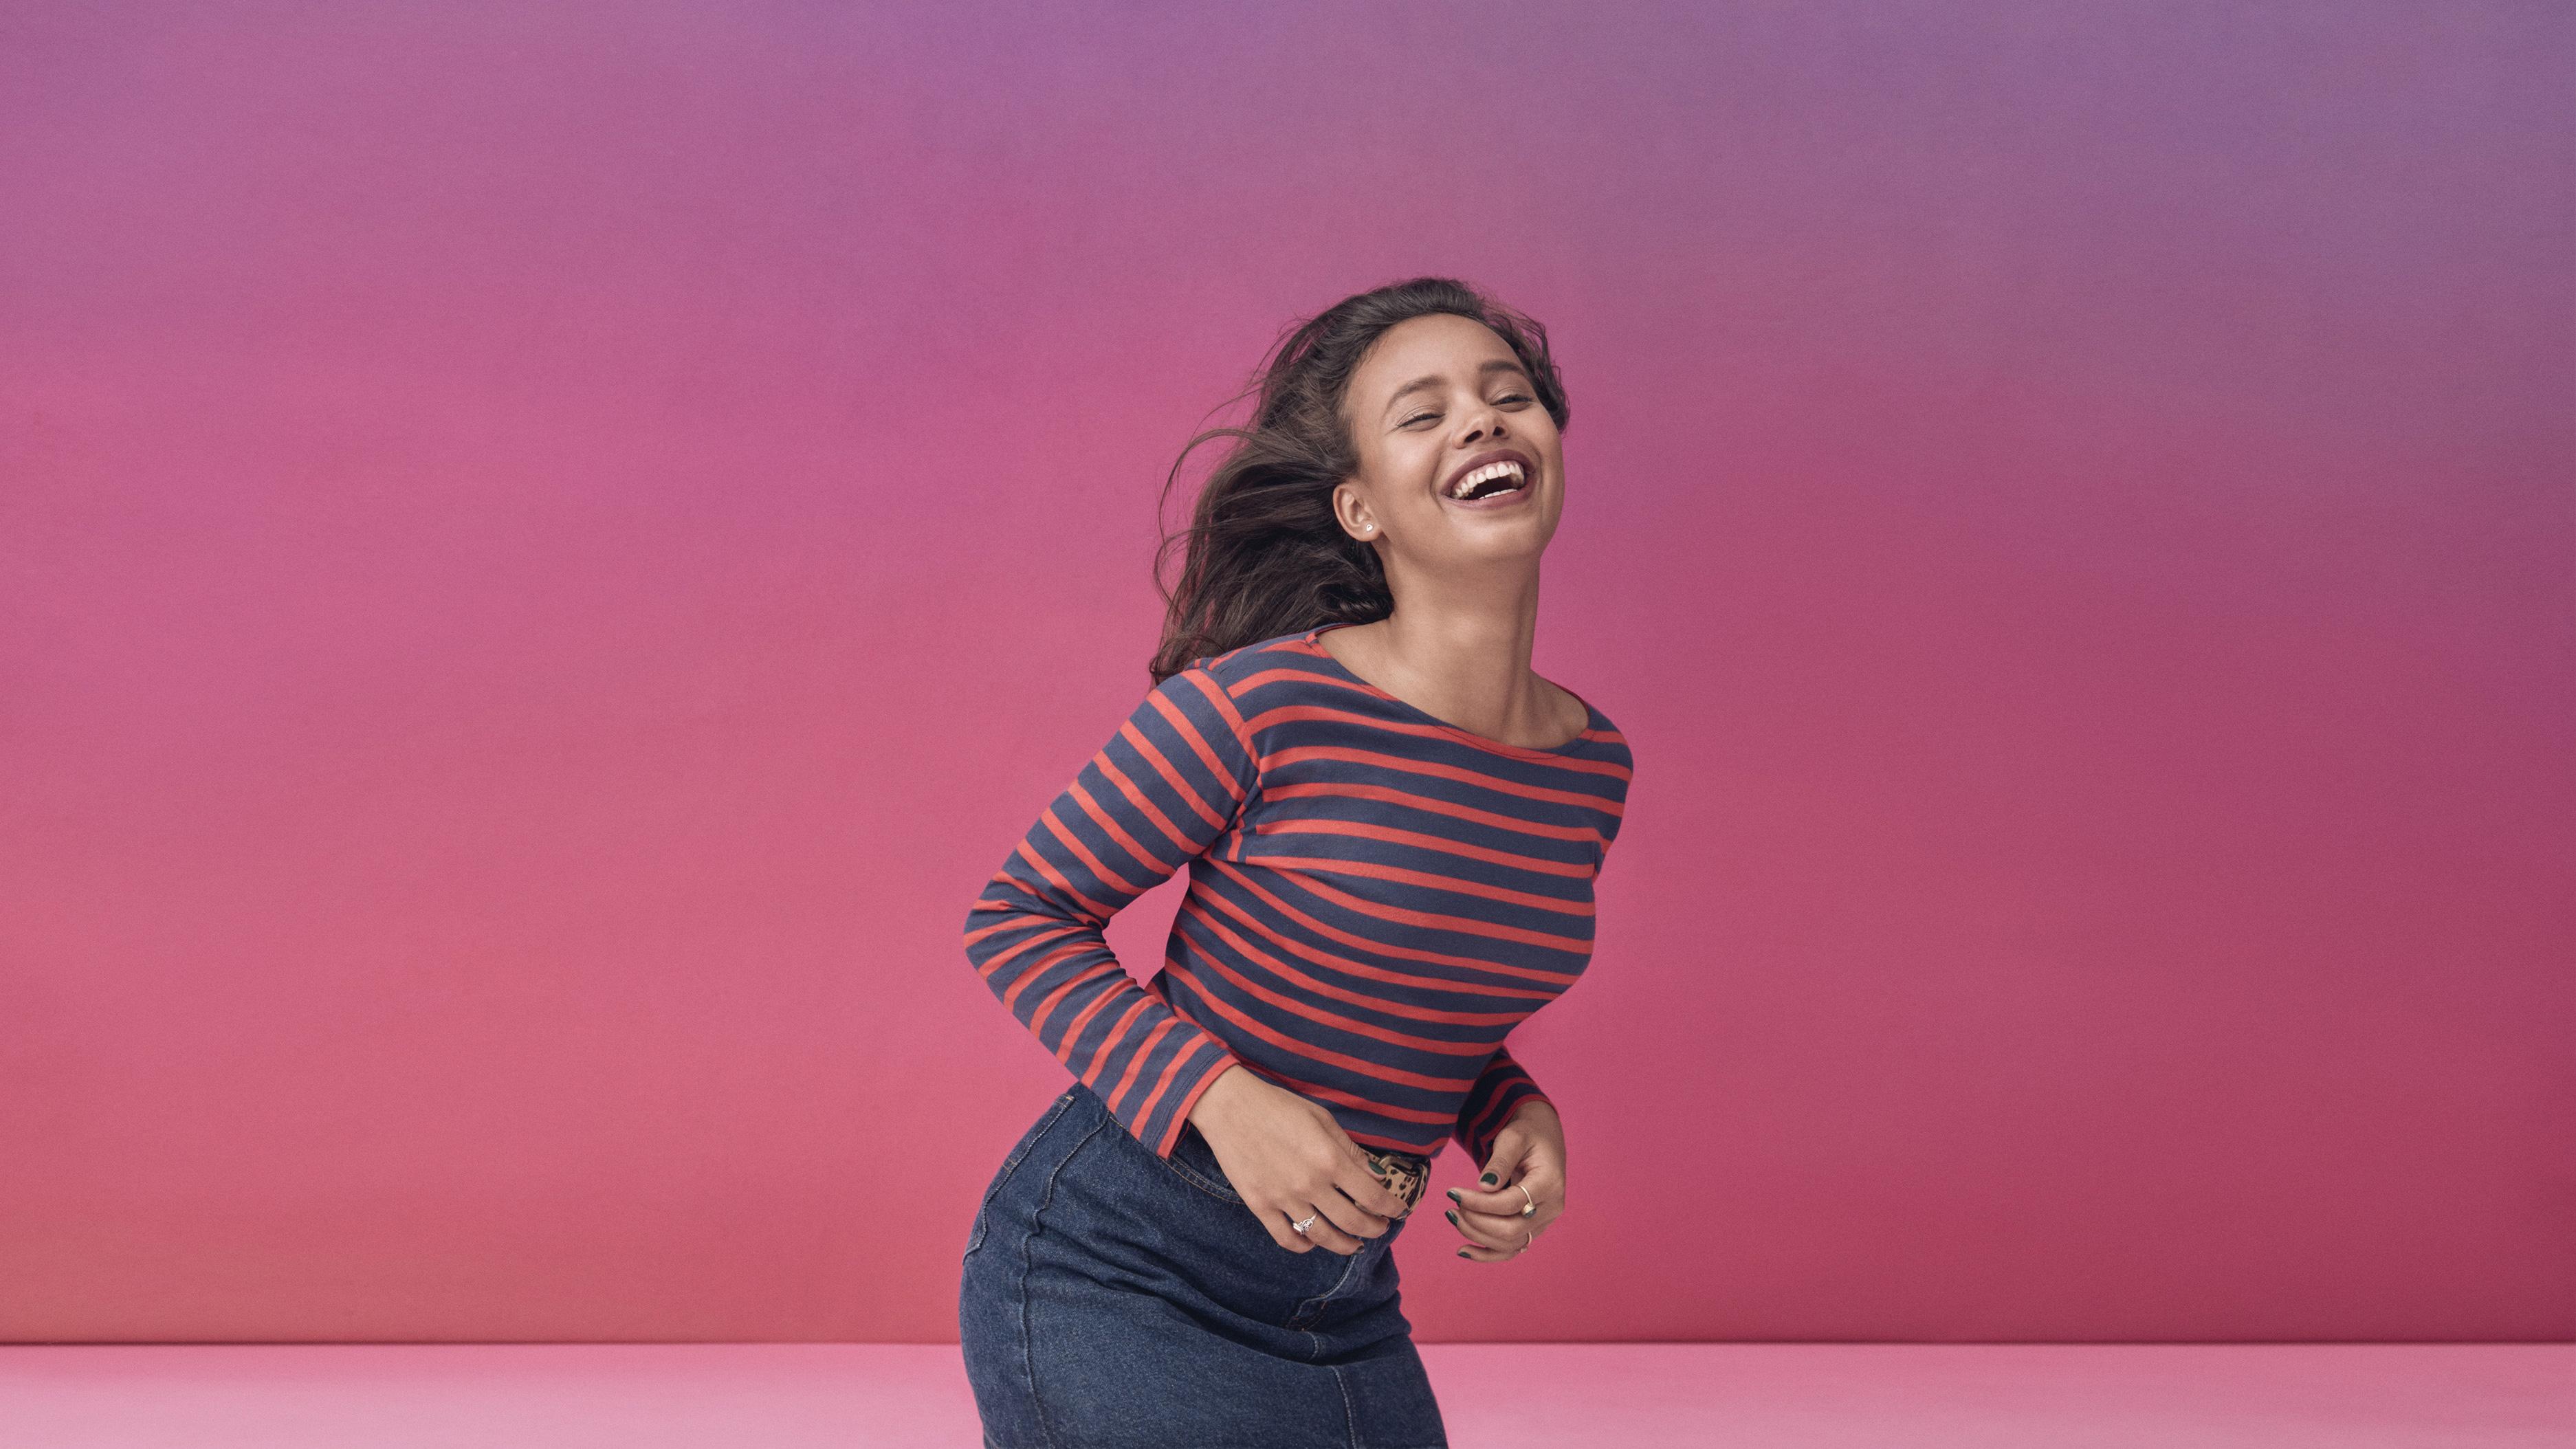 happy alisha boe actress wallpaper background 64062